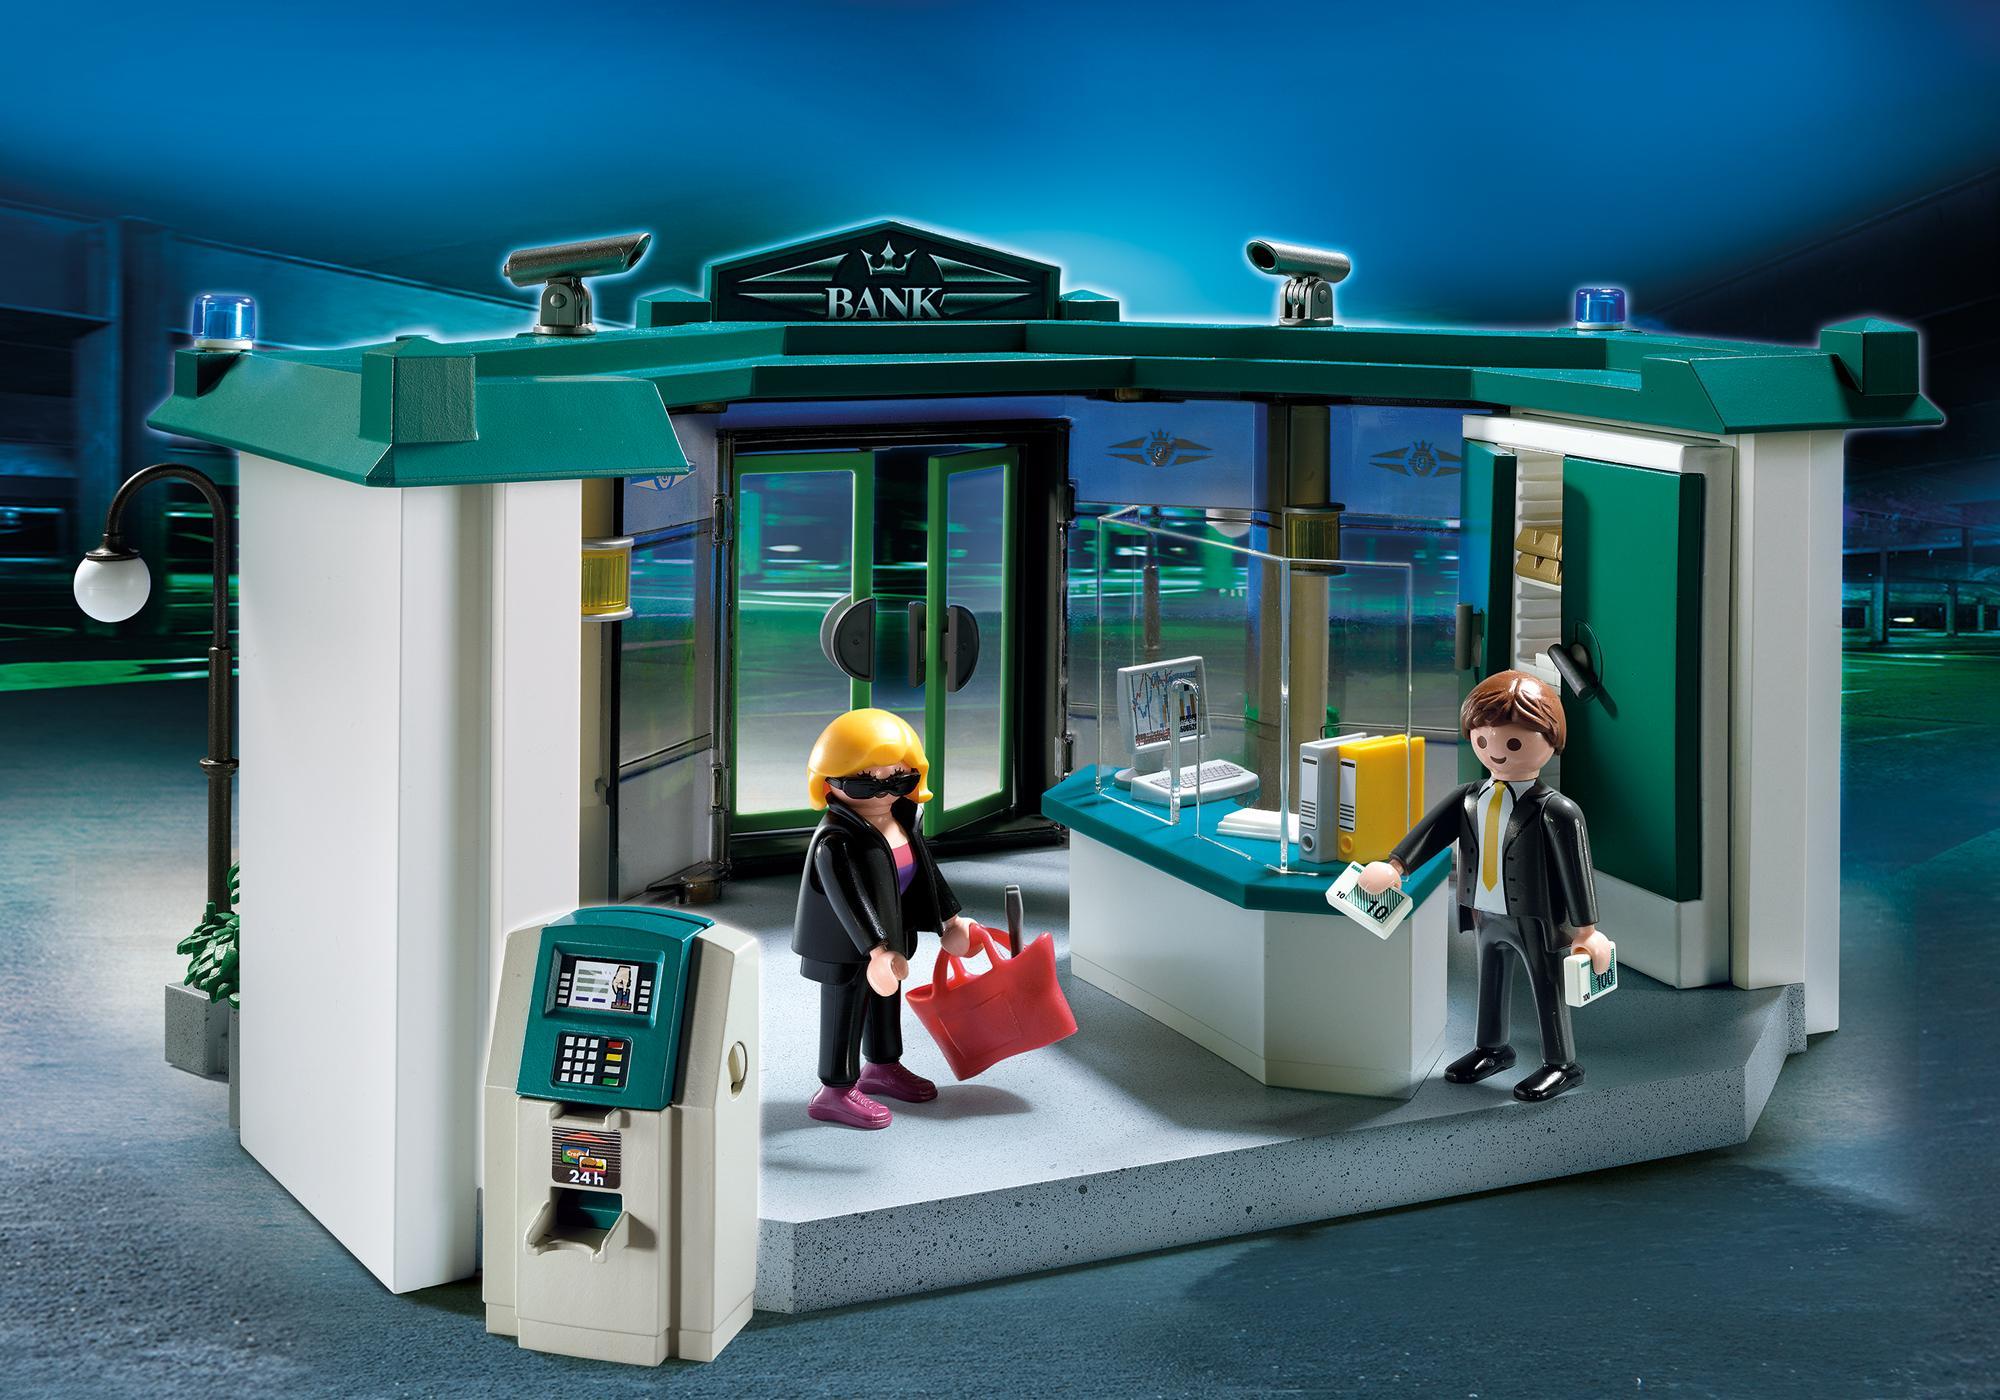 http://media.playmobil.com/i/playmobil/5177-A_product_detail/Bank mit Geldautomat